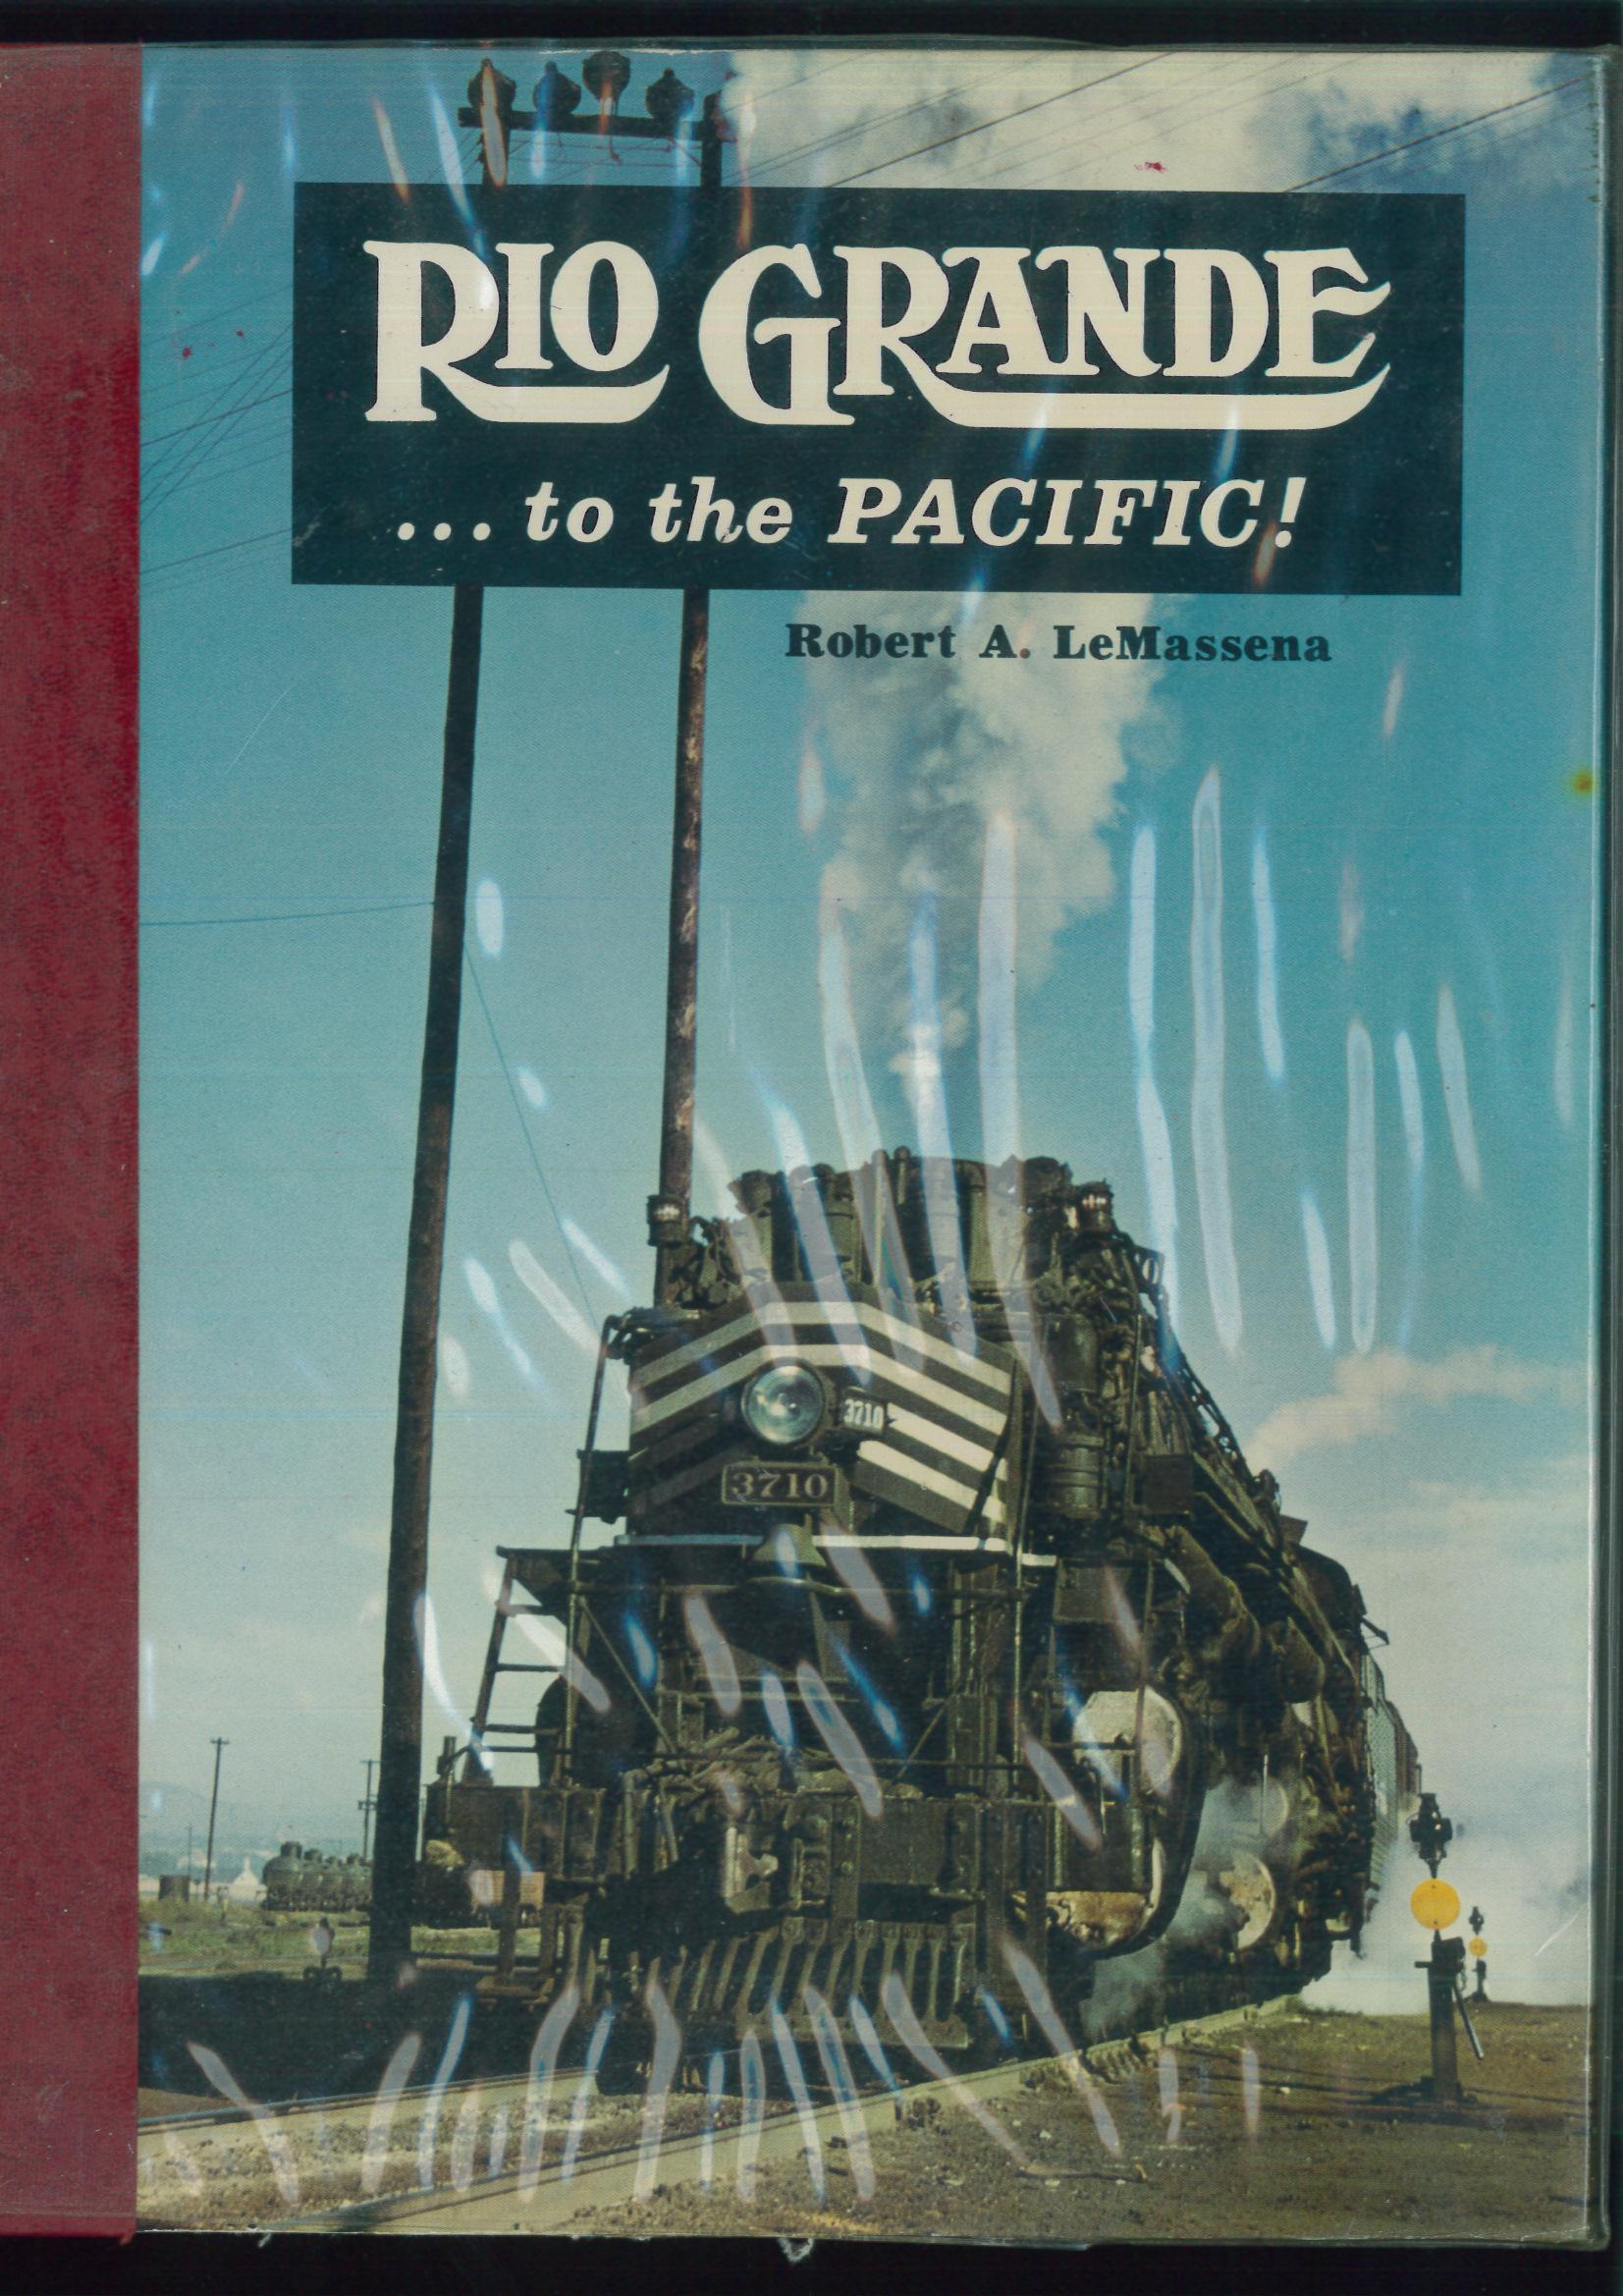 Rio Grande to the Pacific  - Robert LeMassena  - Sundance Books | günstig bestellen bei Modelleisenbahn Center  MCS Vertriebs GmbH